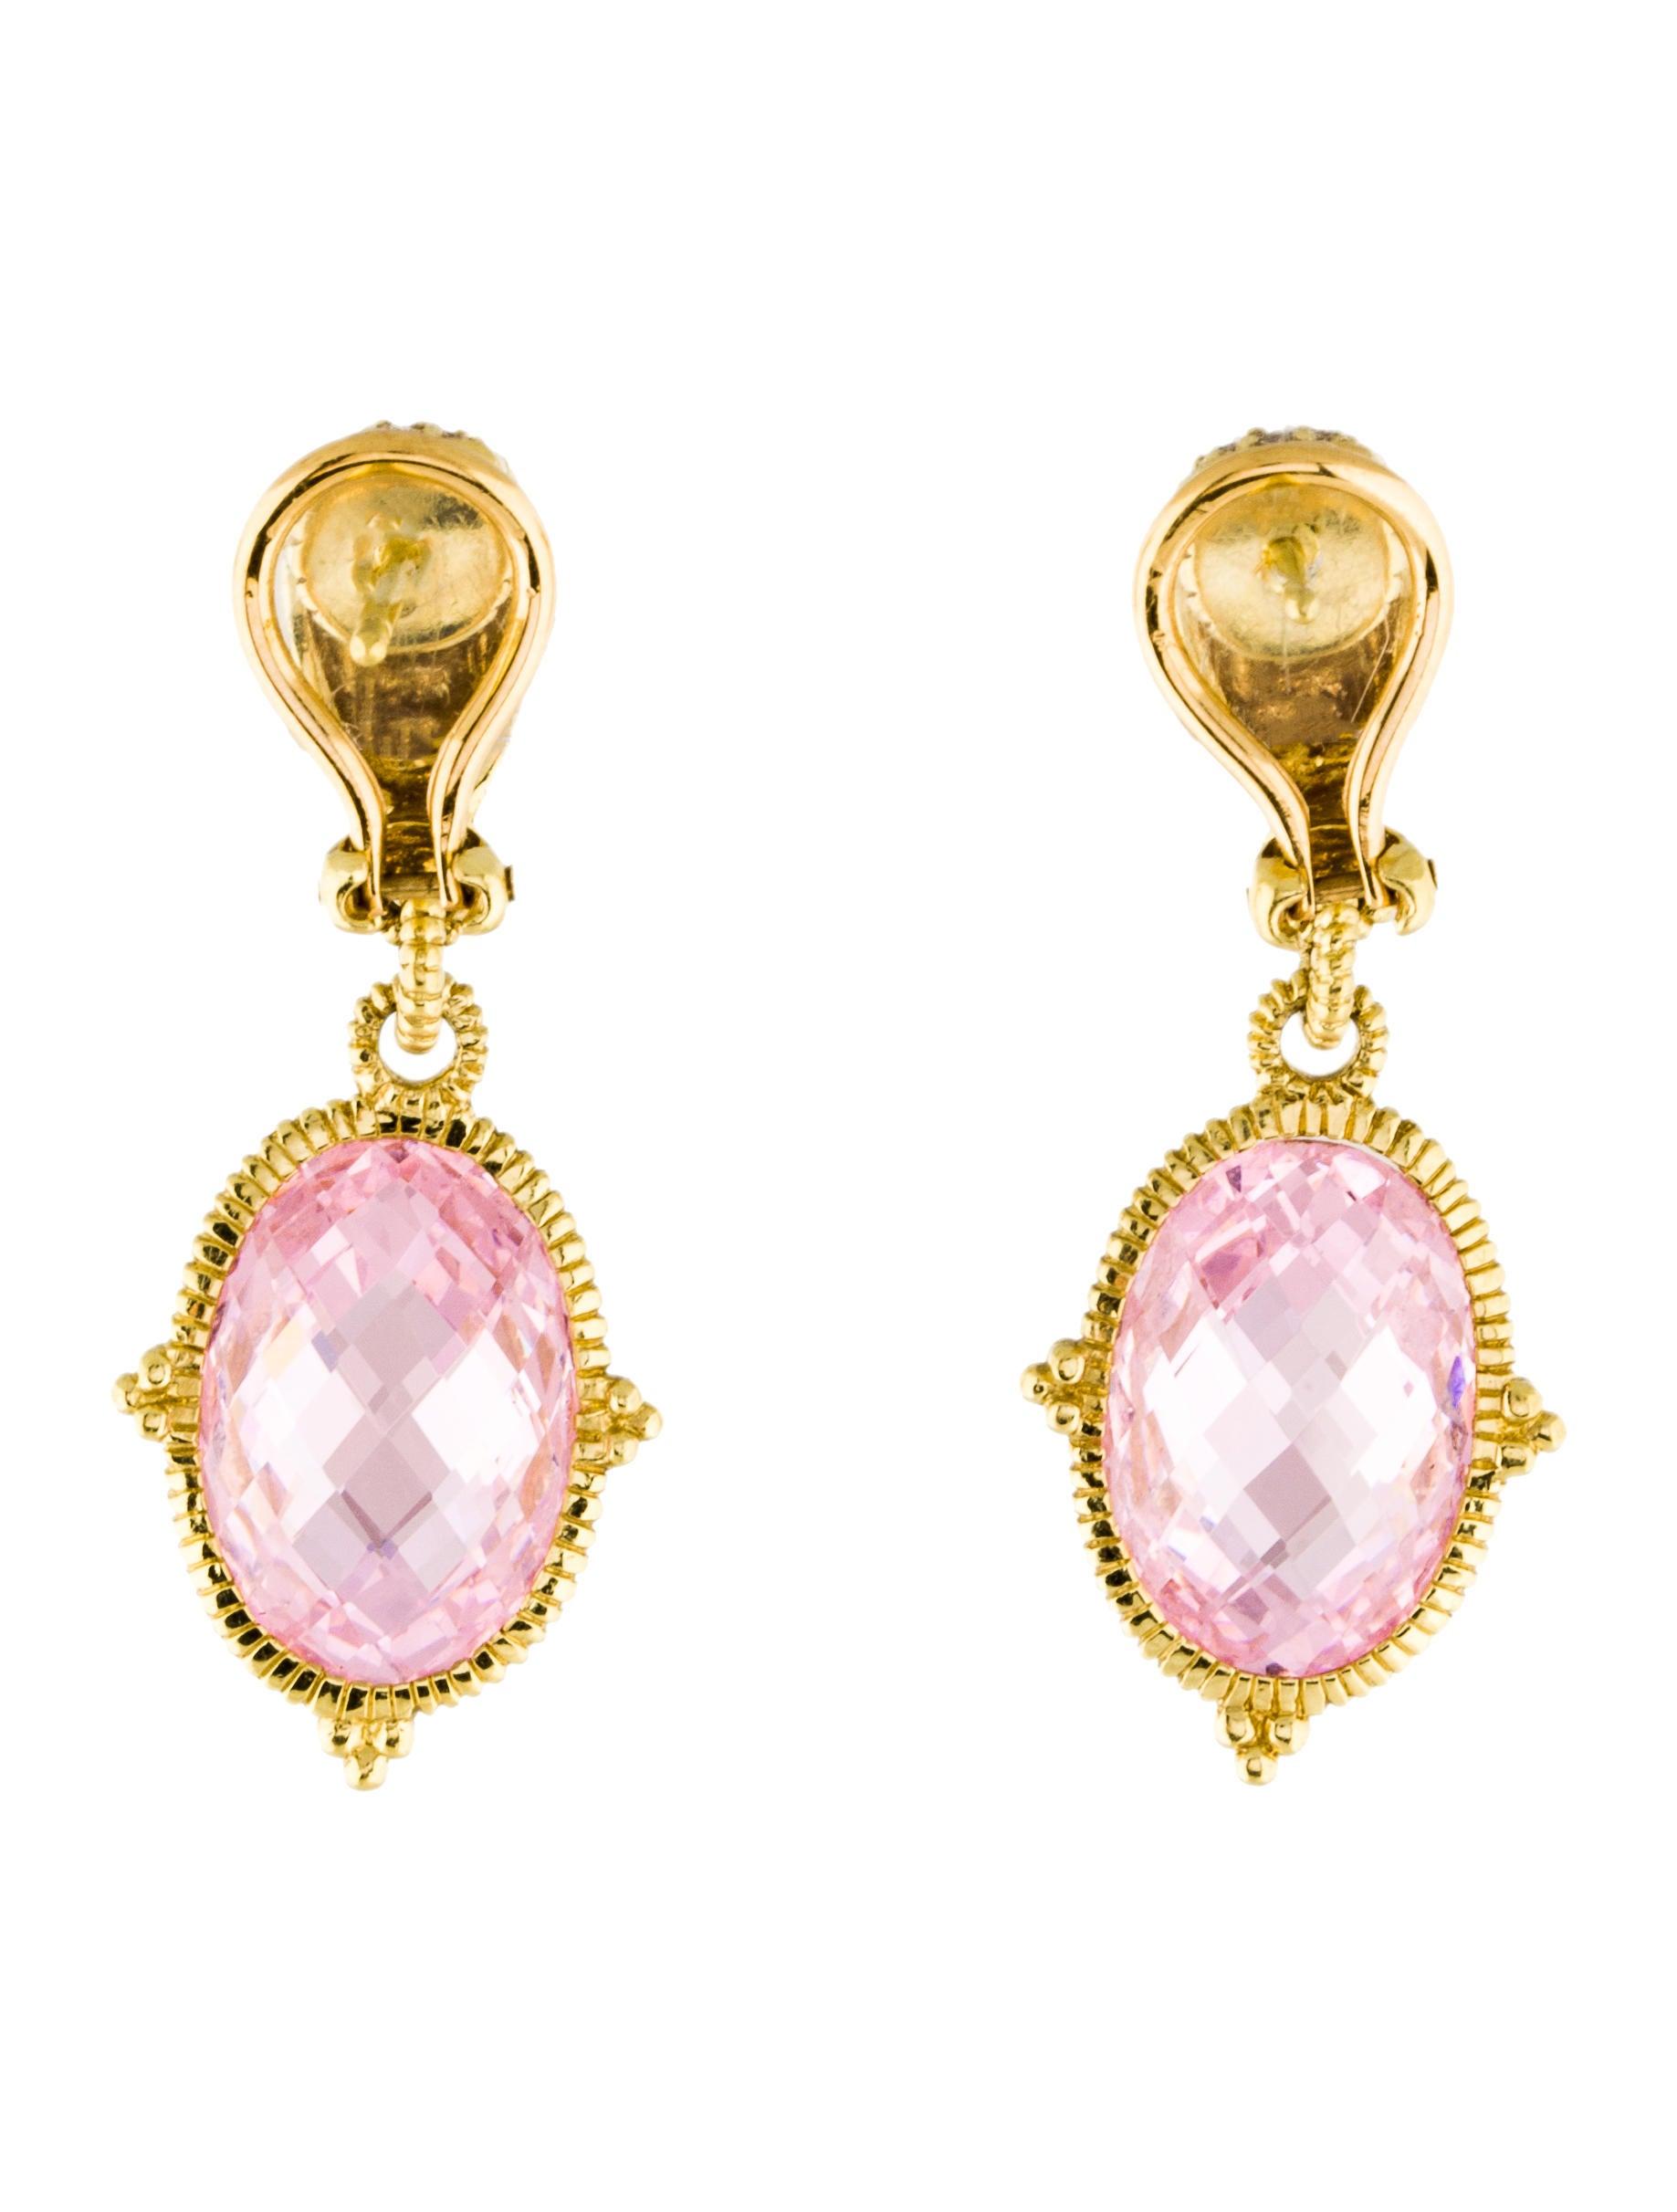 Crystal Diamond Silver Golden Round Flower Heart Anklet: Judith Ripka 18K Pink Crystal & Diamond Drop Earrings